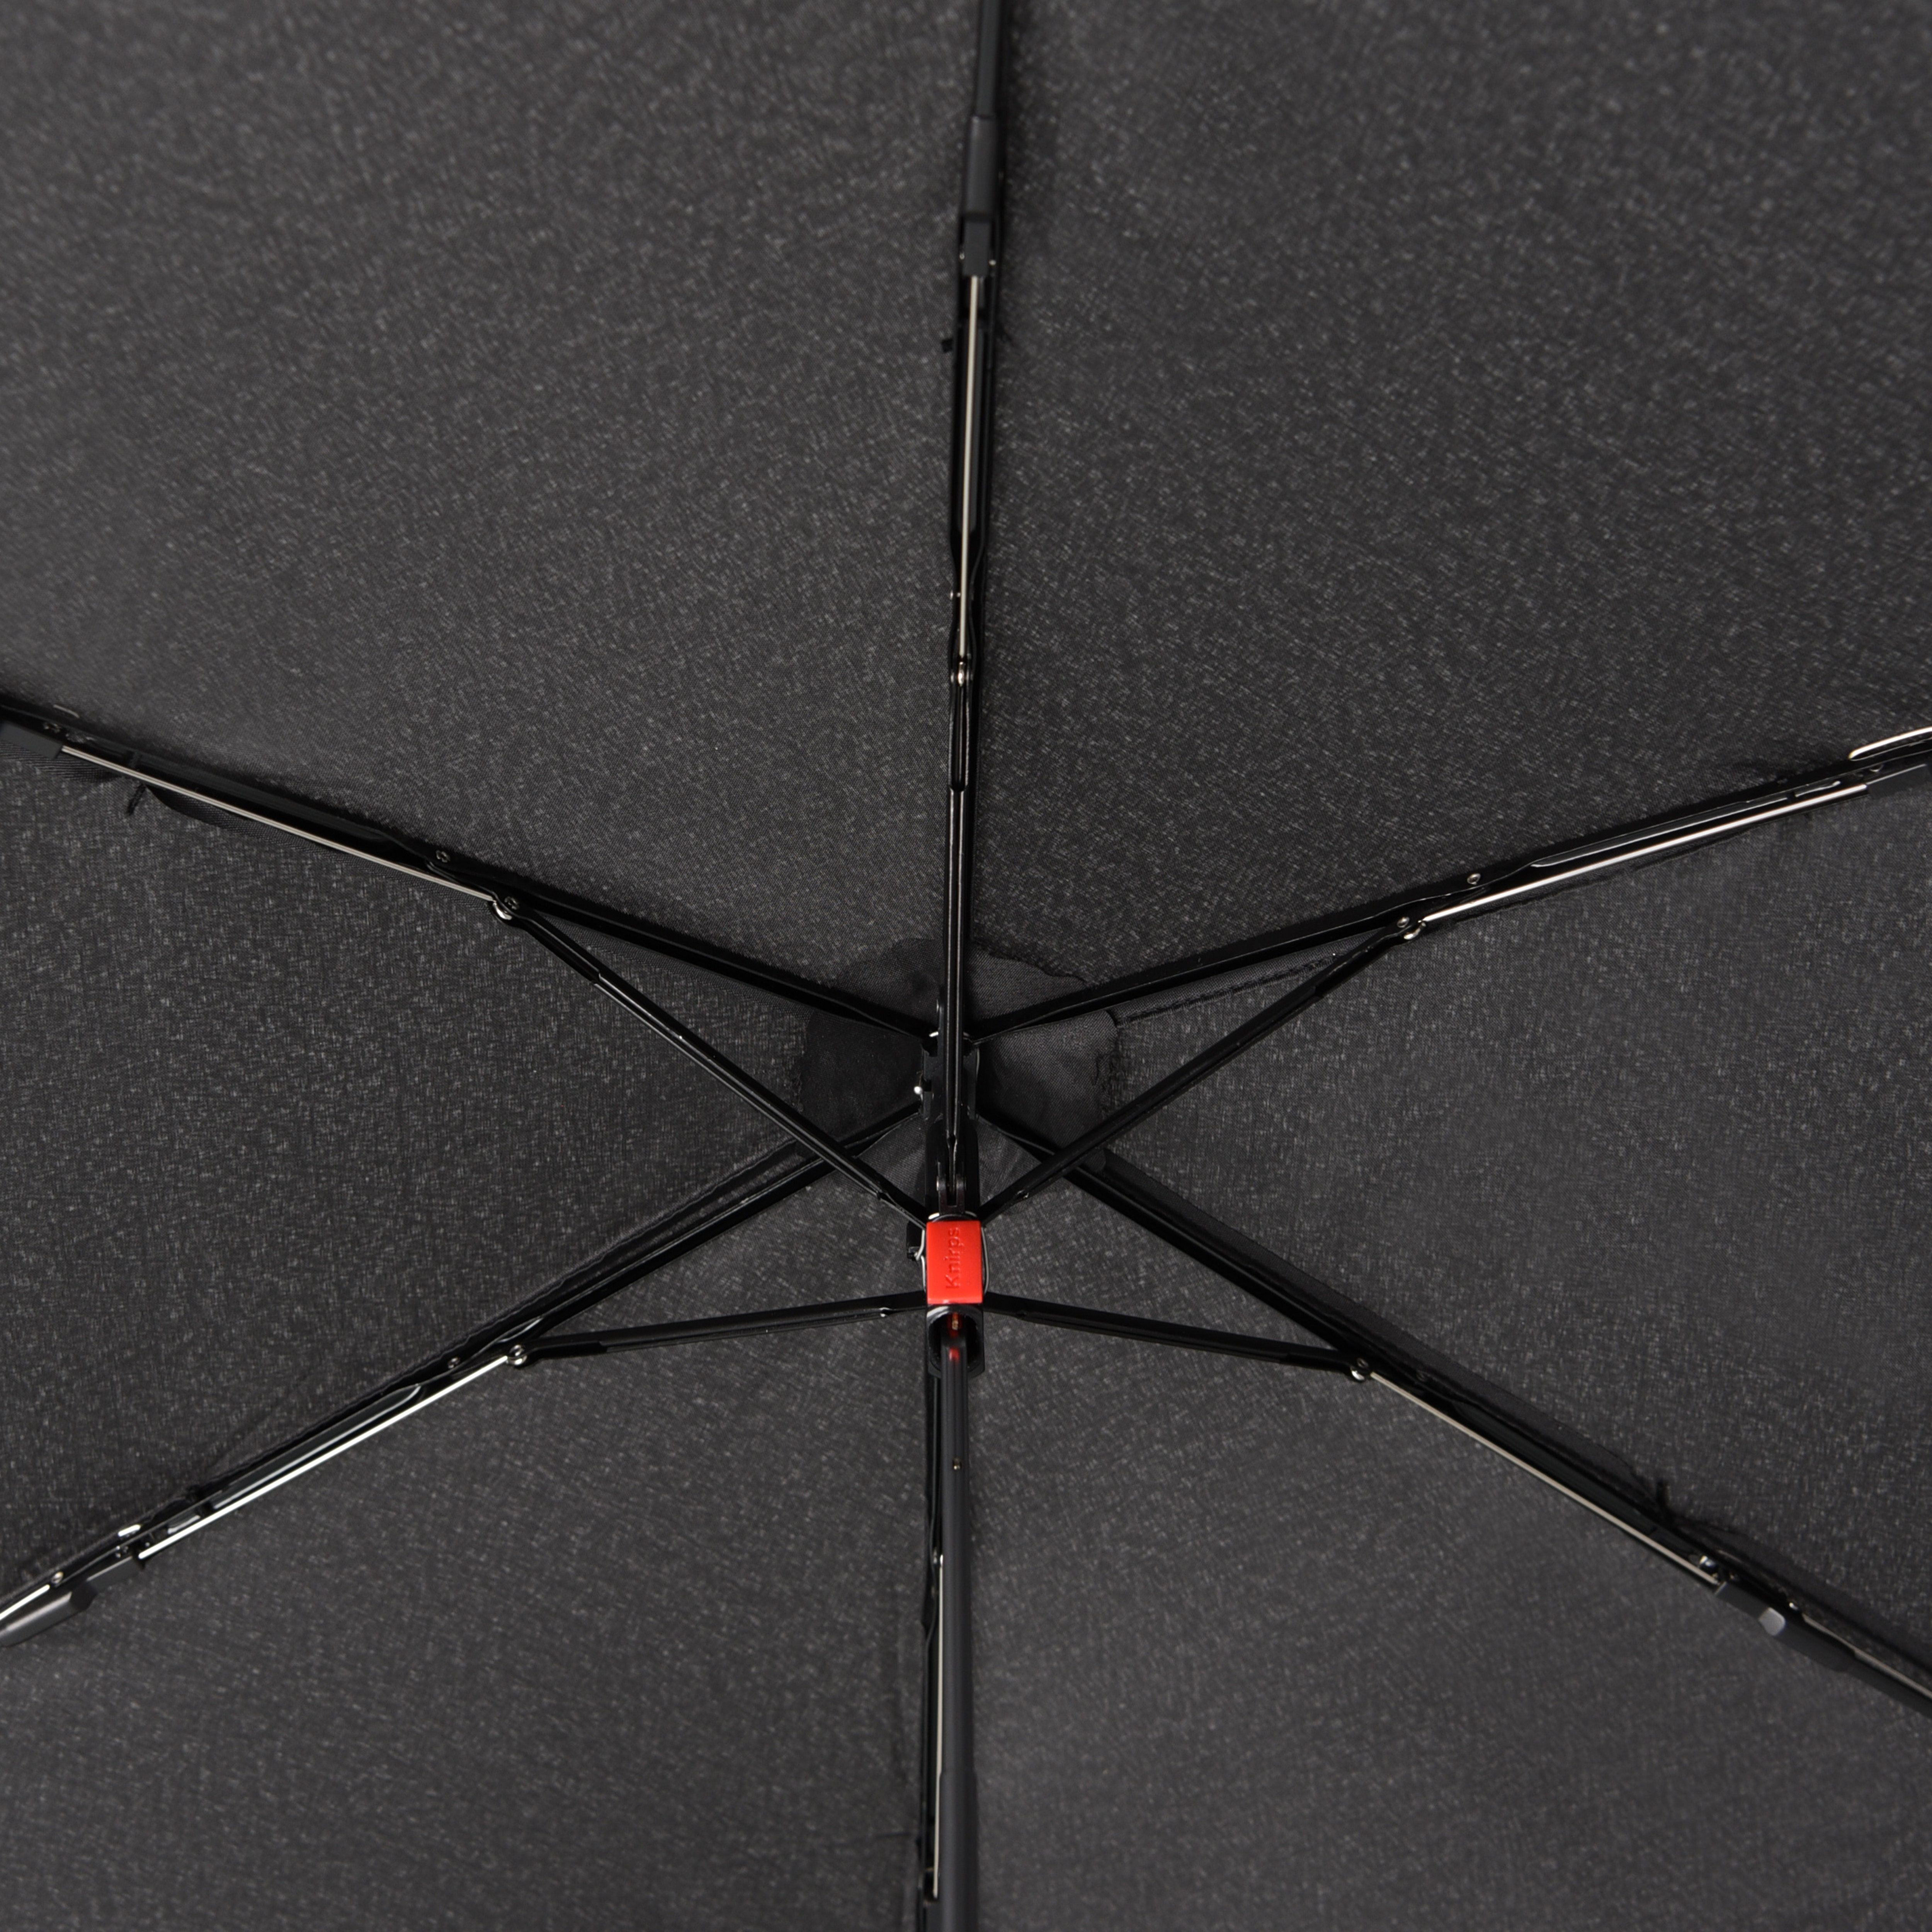 Knirps Umbrella AS.050 slim small manual - foto 4